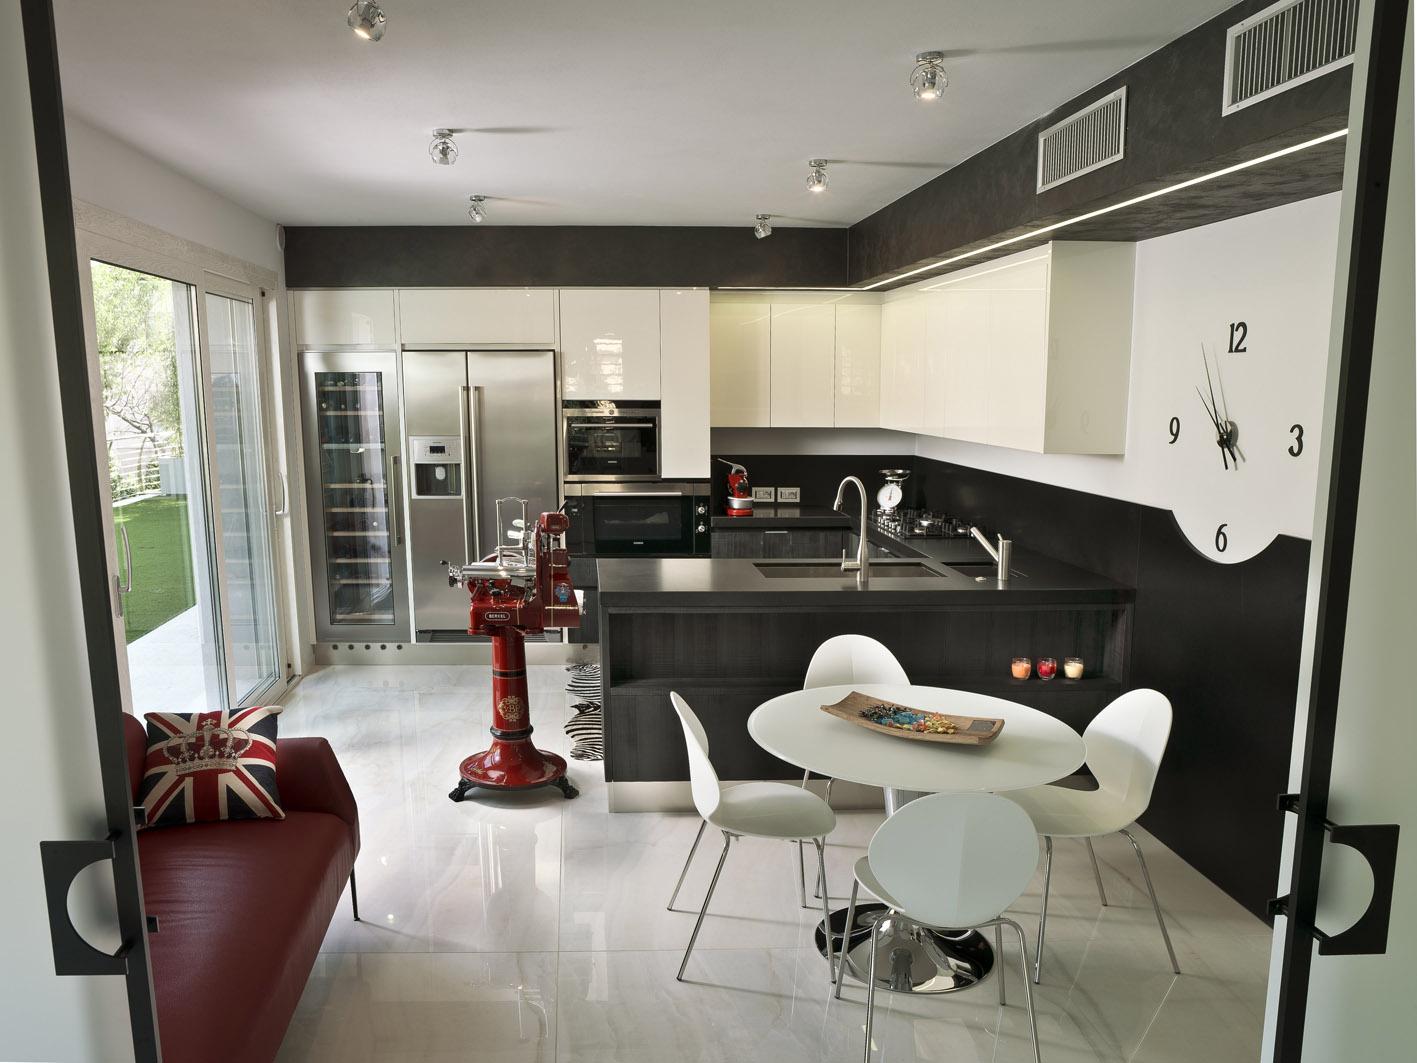 cucina moderna MG architettura d'interni simone casarotto design pietra lavica berkel tavolo saarinen